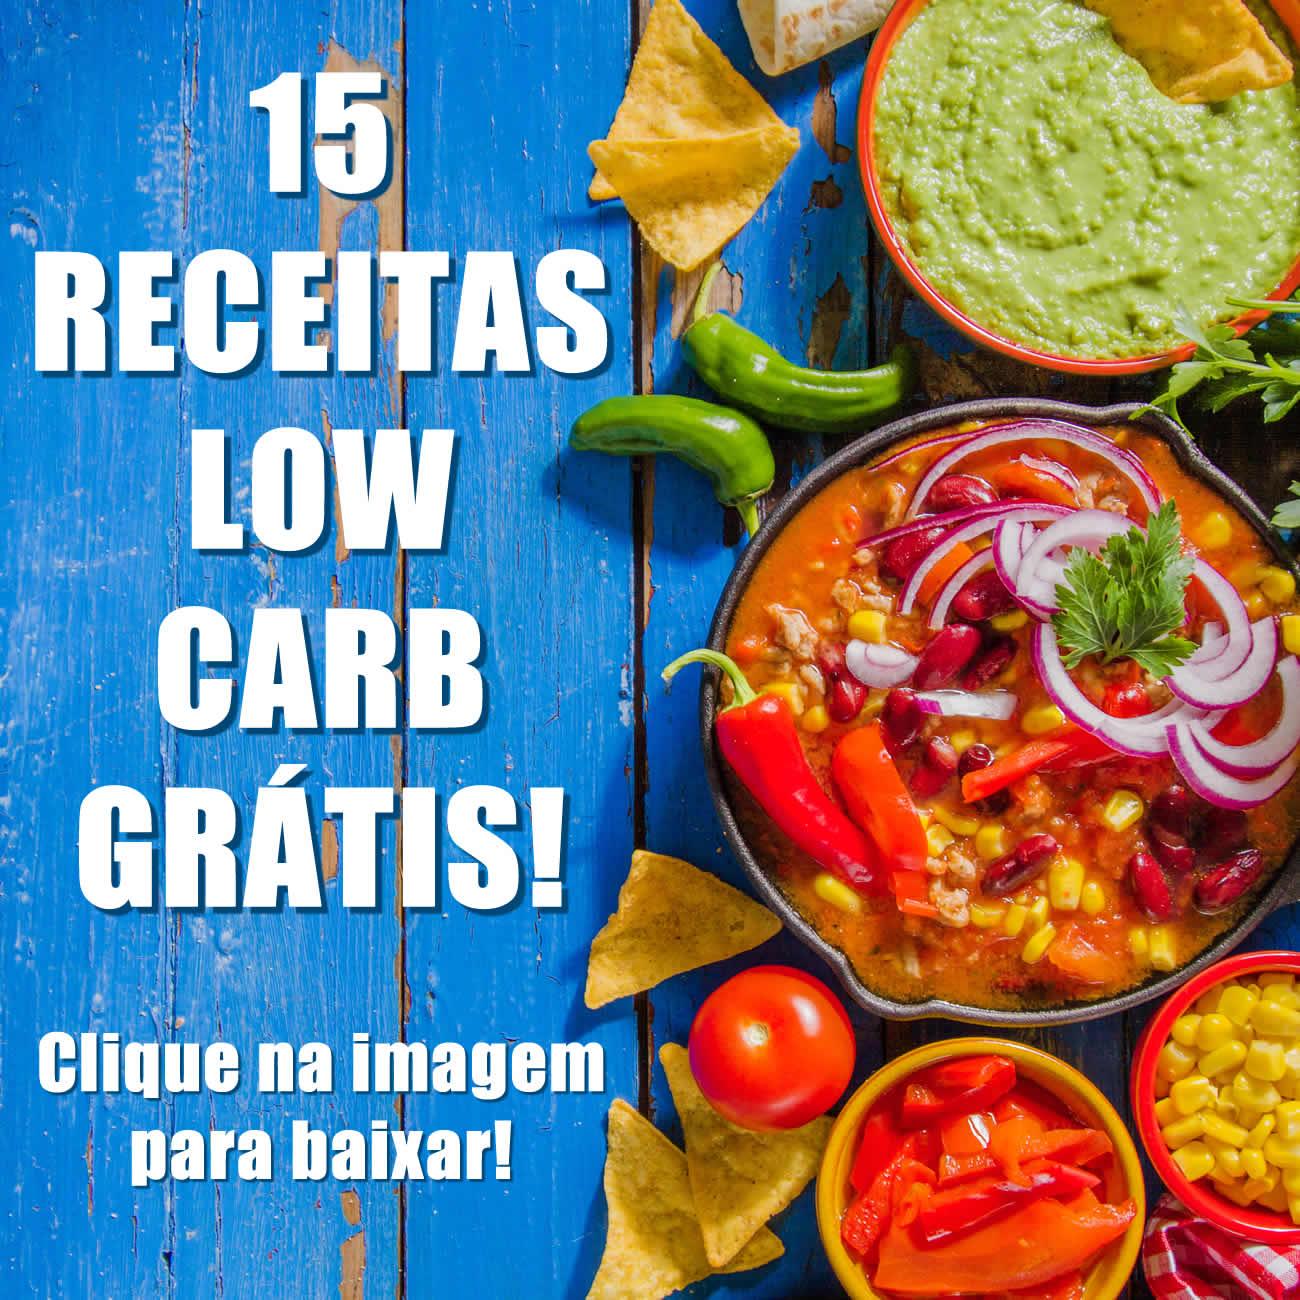 Download GRÁTIS - 15 Receitas Low Carb